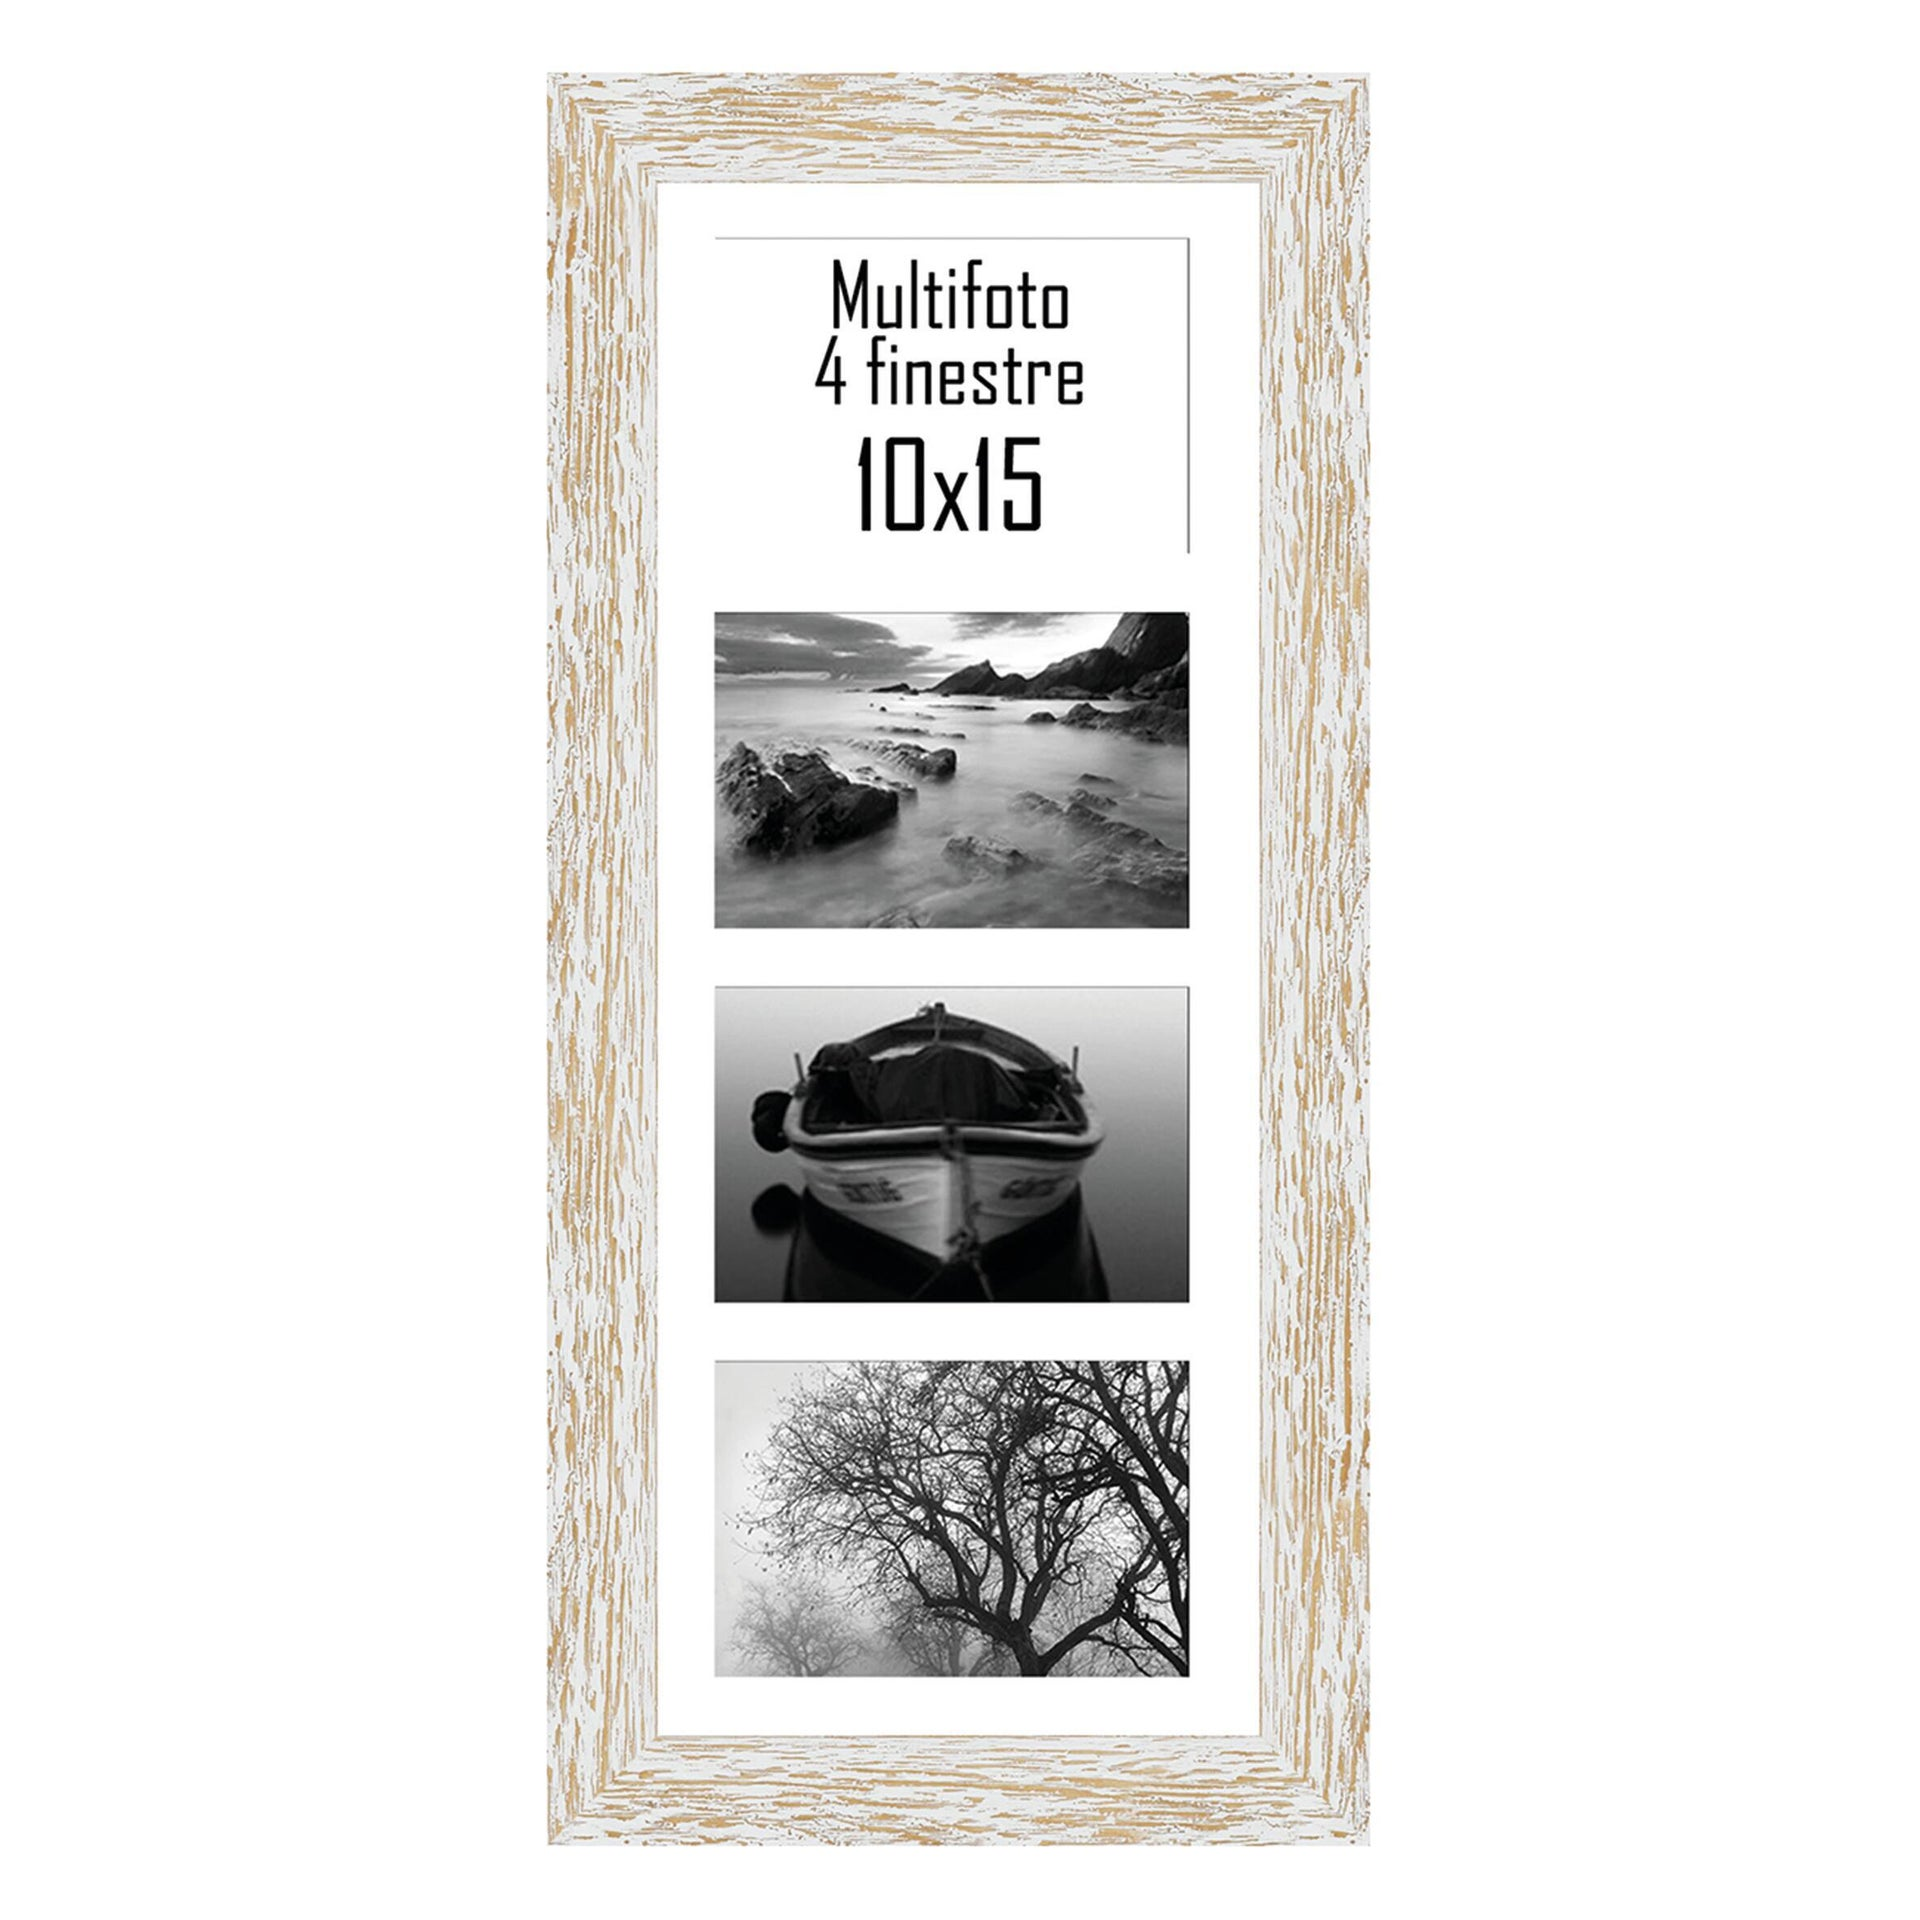 Cornice Gaia per 4 fotografie 10 x 15 bianco<multisep/>bianco - 1